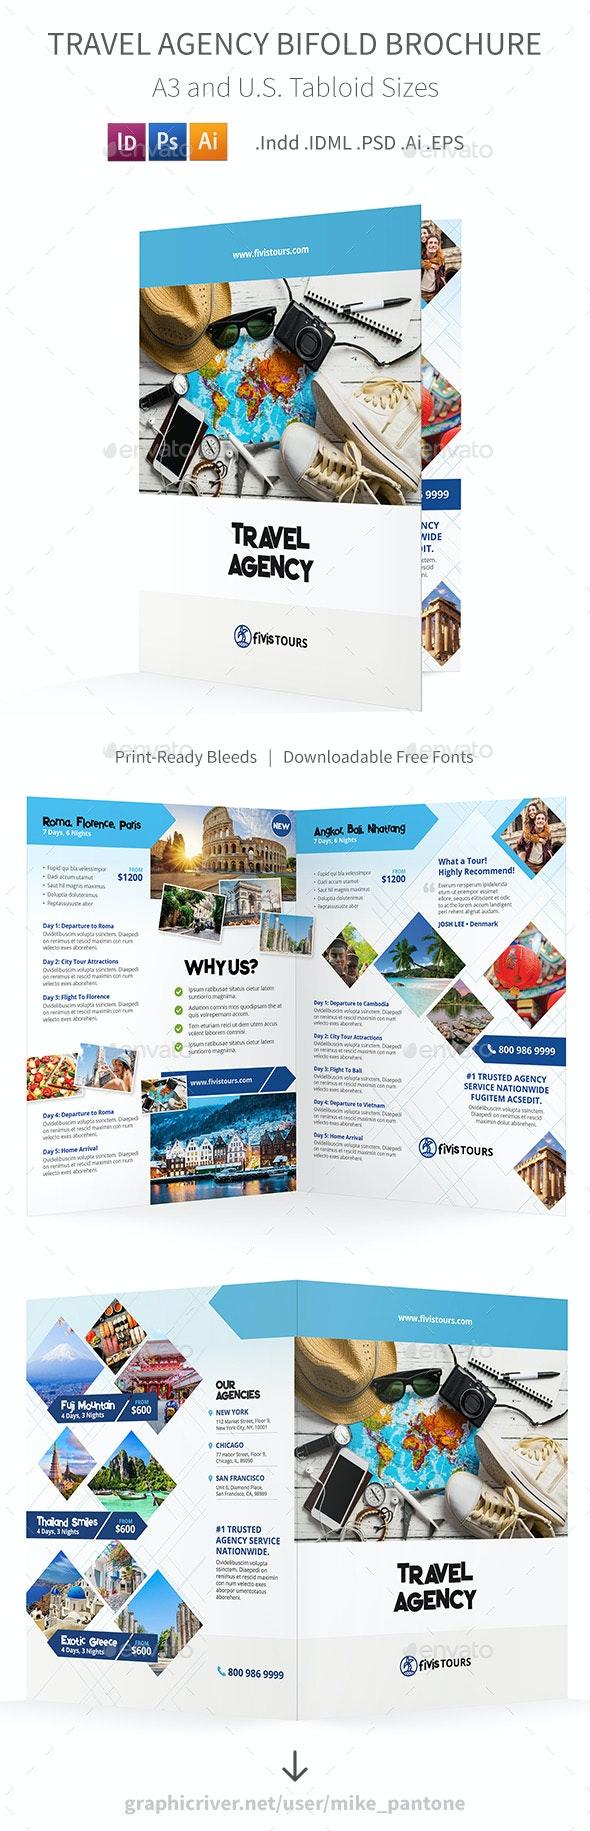 Travel Agency Bifold / Halffold Brochure 3 by Mike_pantone